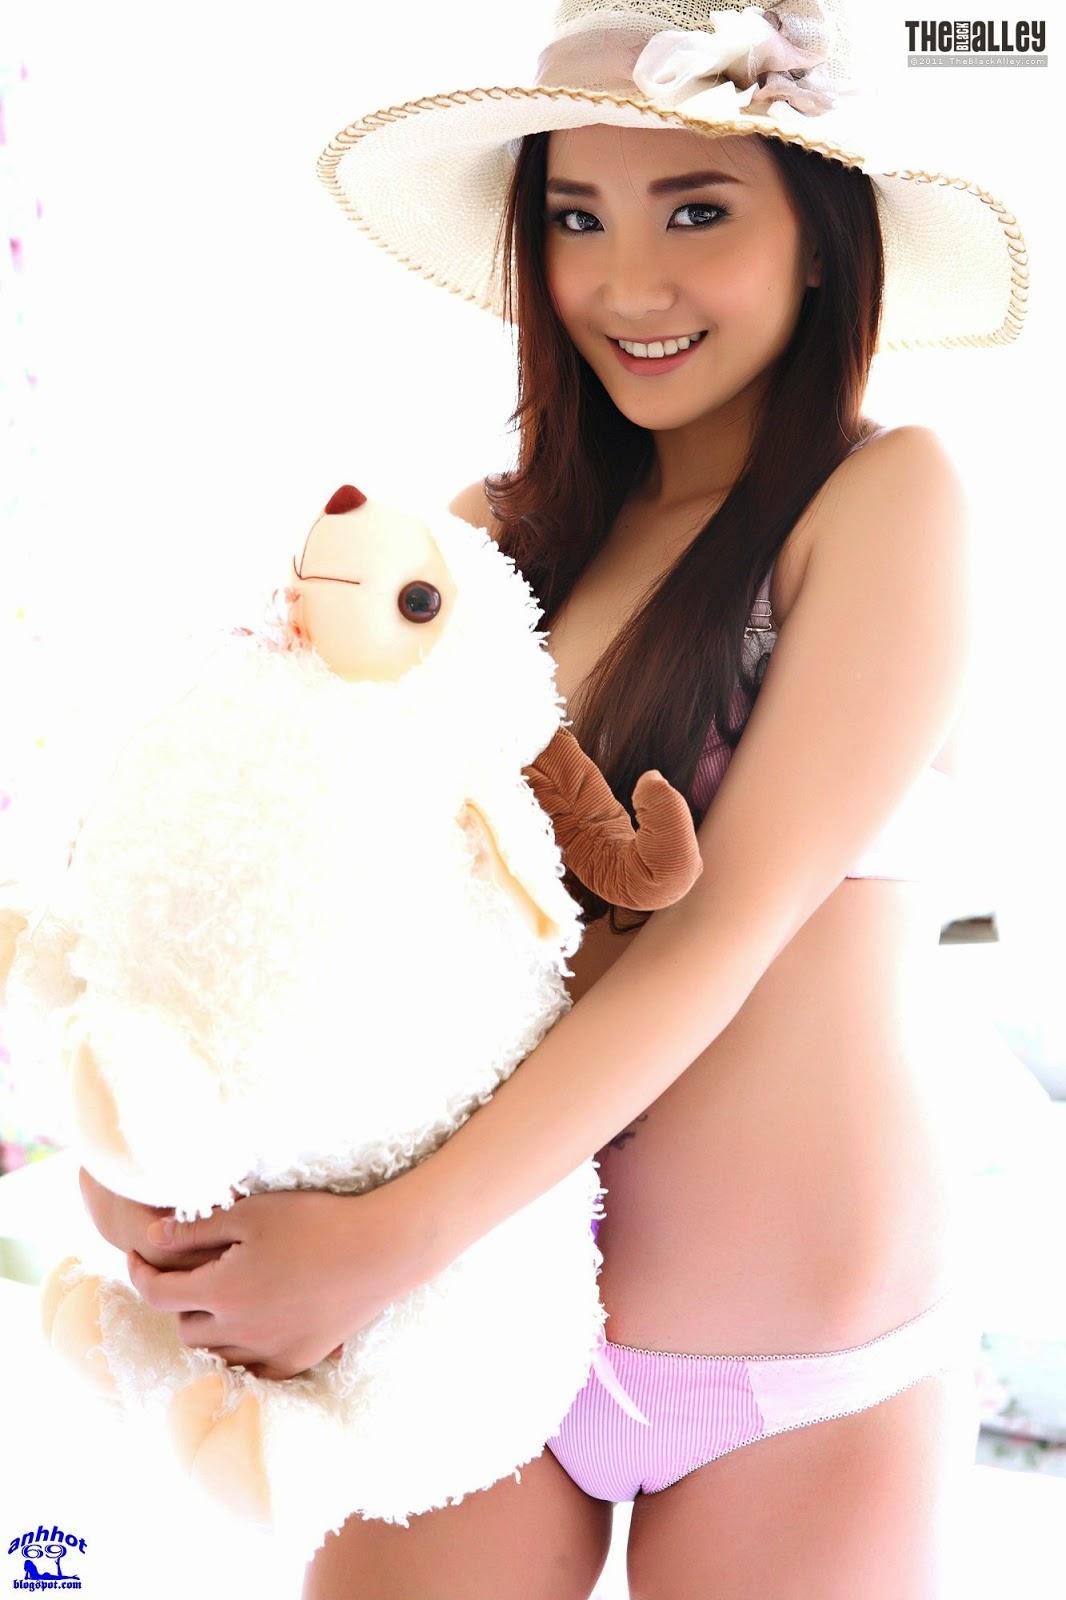 lolita-cheng-64-015